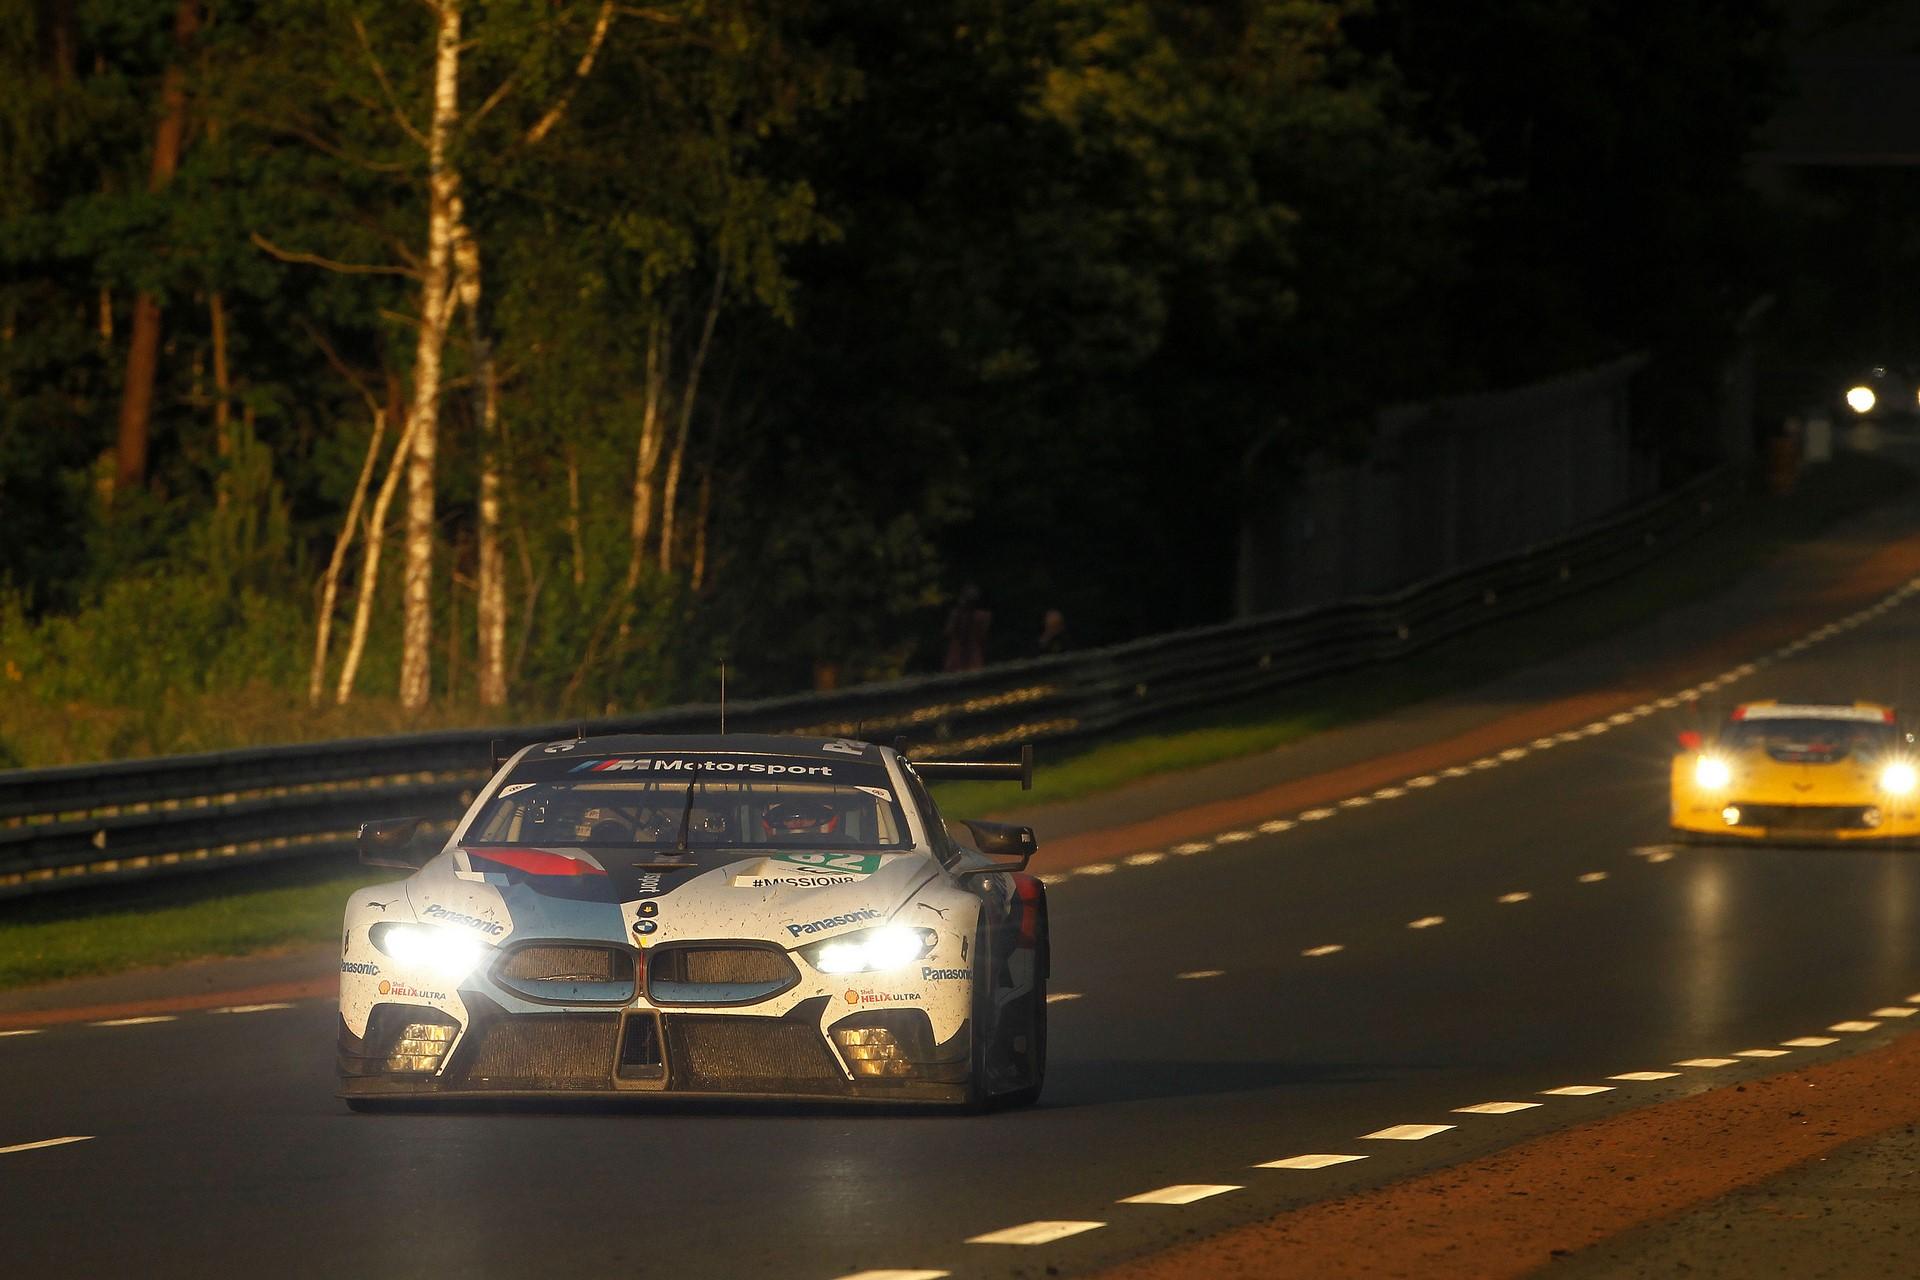 Le Mans (FRA), 16th June 2018. BMW M Motorsport, FIA World Endurance Championship (WEC), 24 Hours of Le Mans, #82 BMW M8 GTE, António Félix da Costa (POR), Alexander Sims (GBR), Augusto Farfus (BRA).